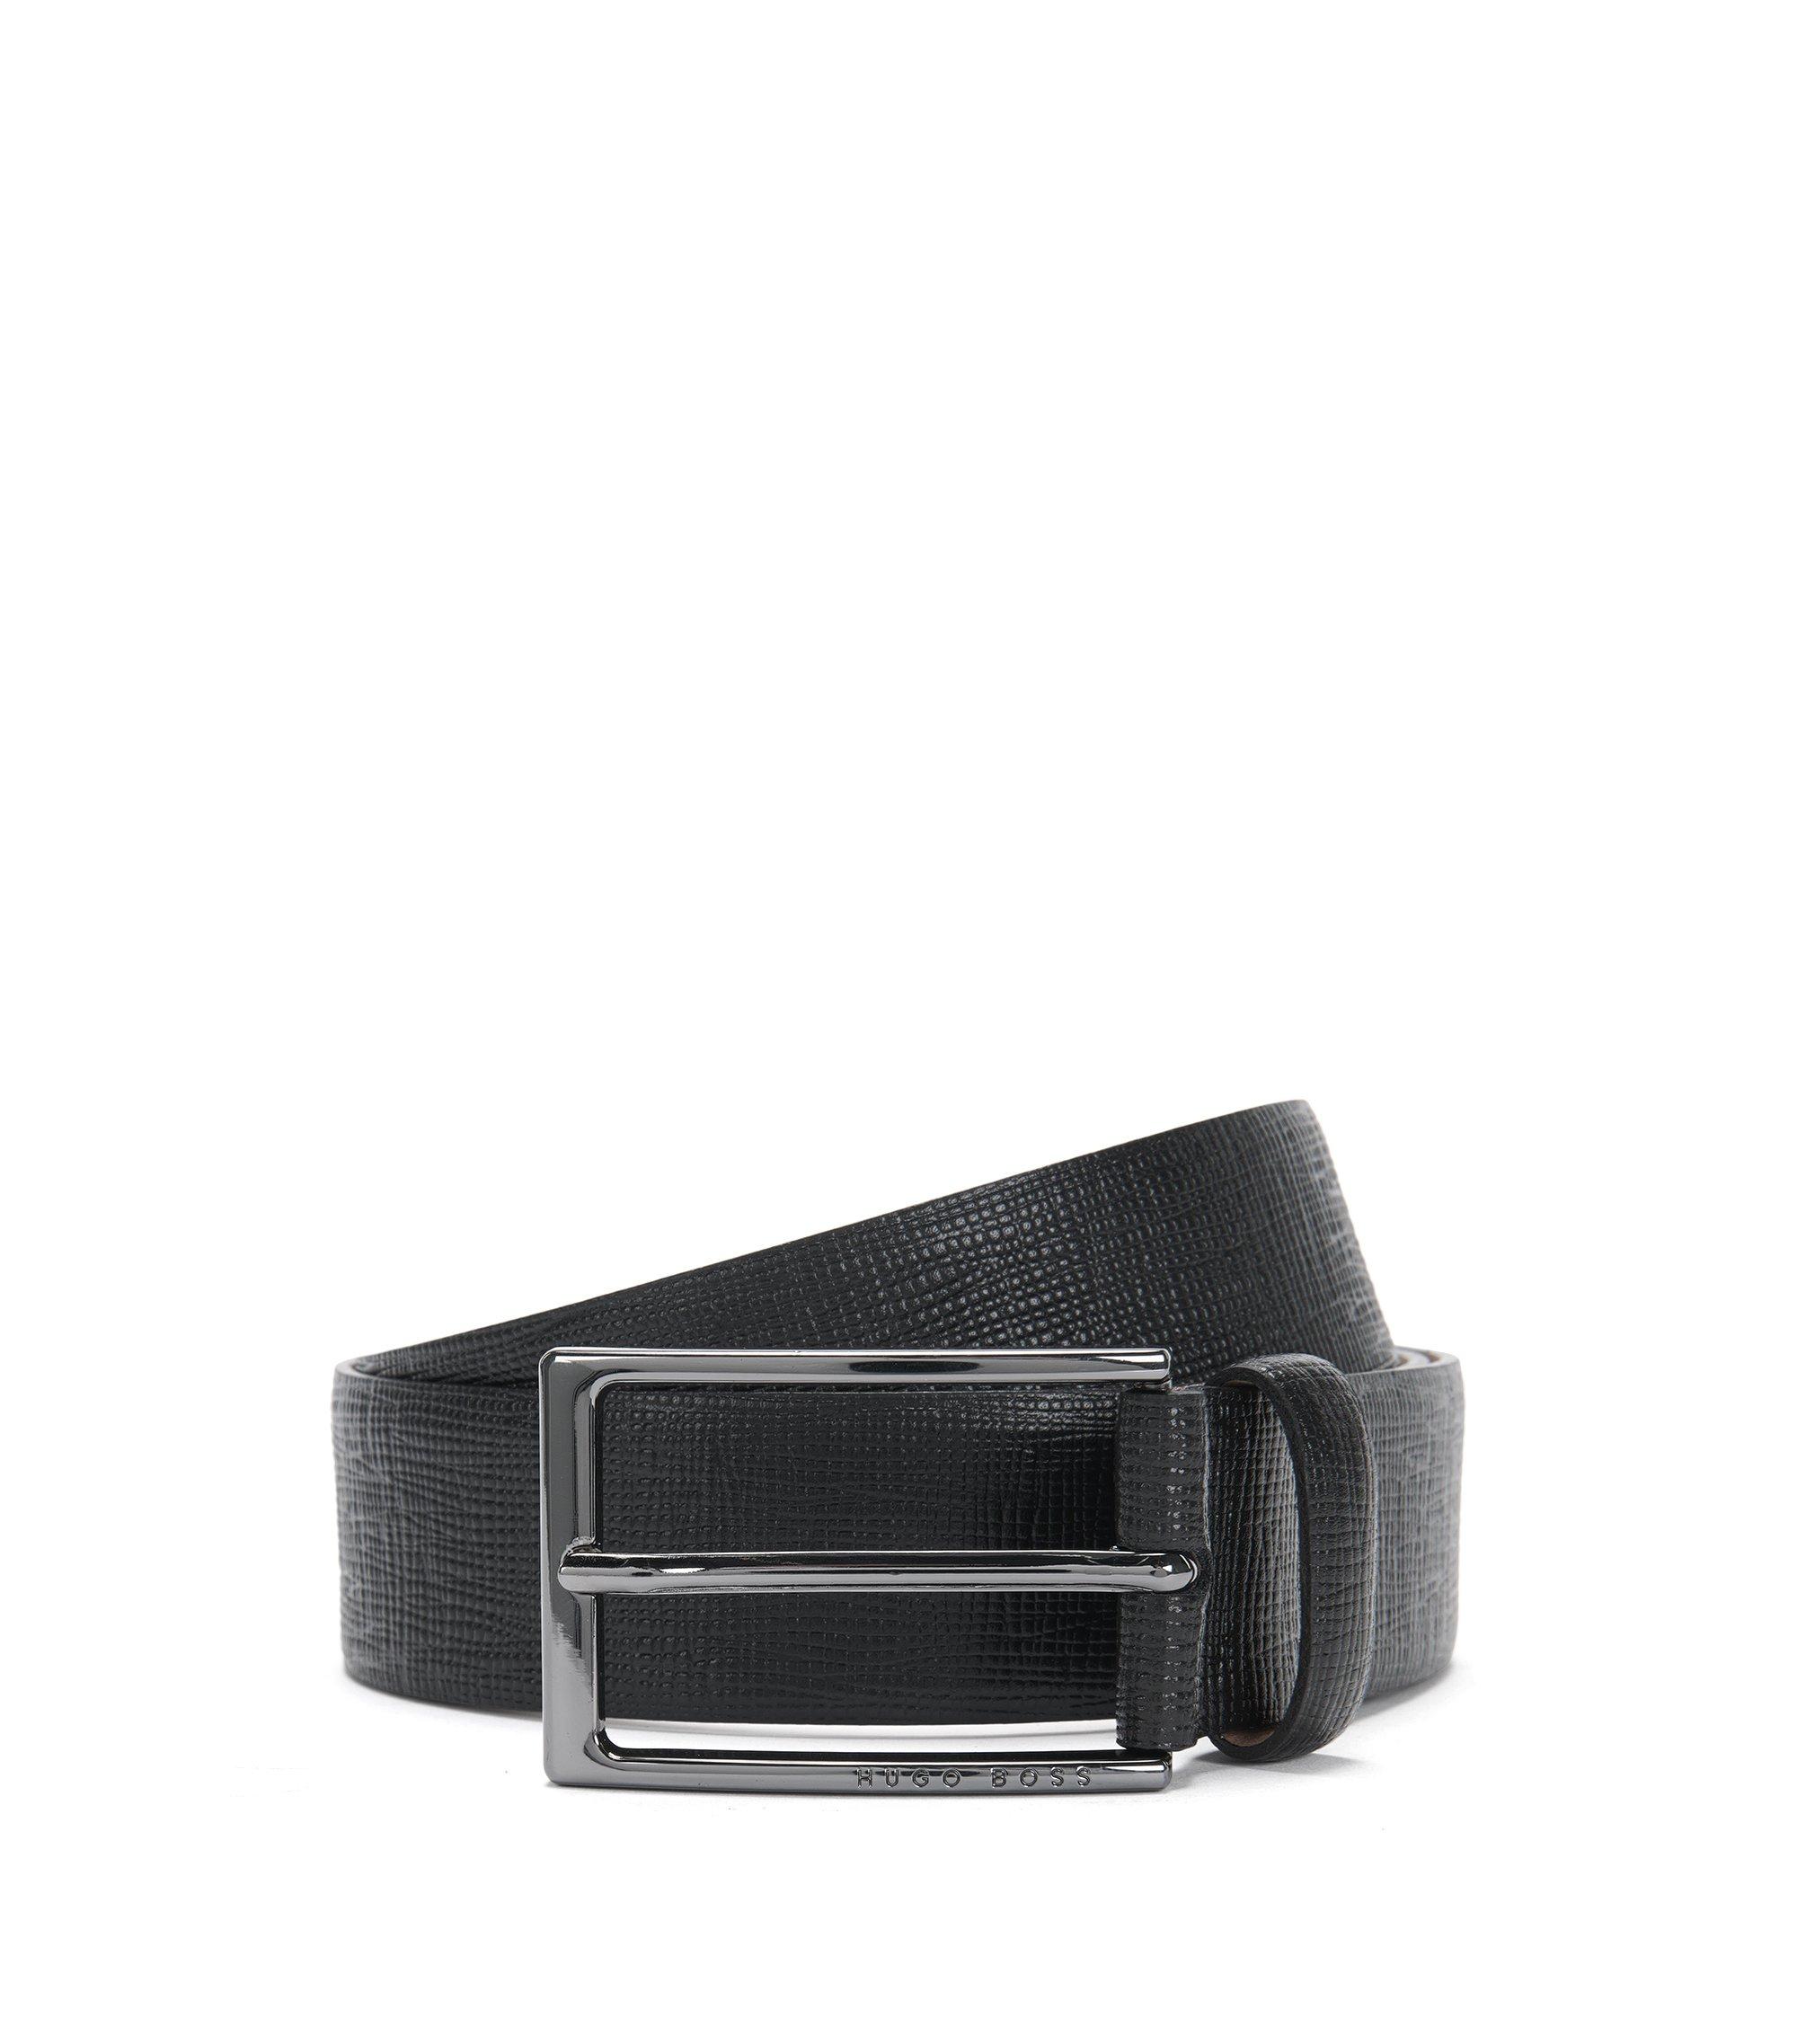 Leather Saffiano Embossed Belt | Naux-G_Sz35_ltem, Black